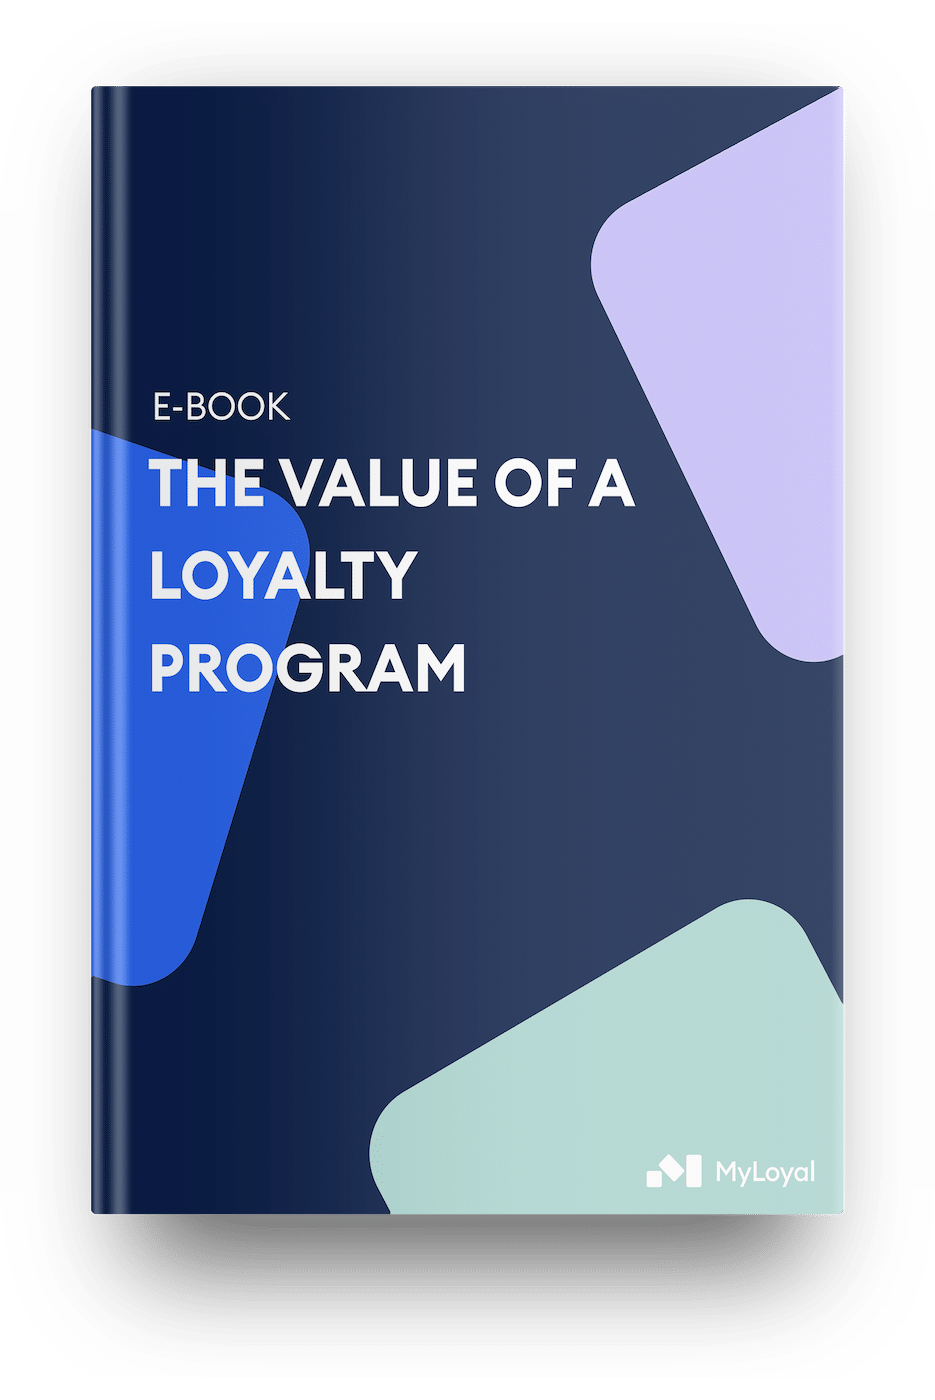 The Value Of Loyalty Programs. Customer Satisfaction, Customer Loyalty, Revenue Growth